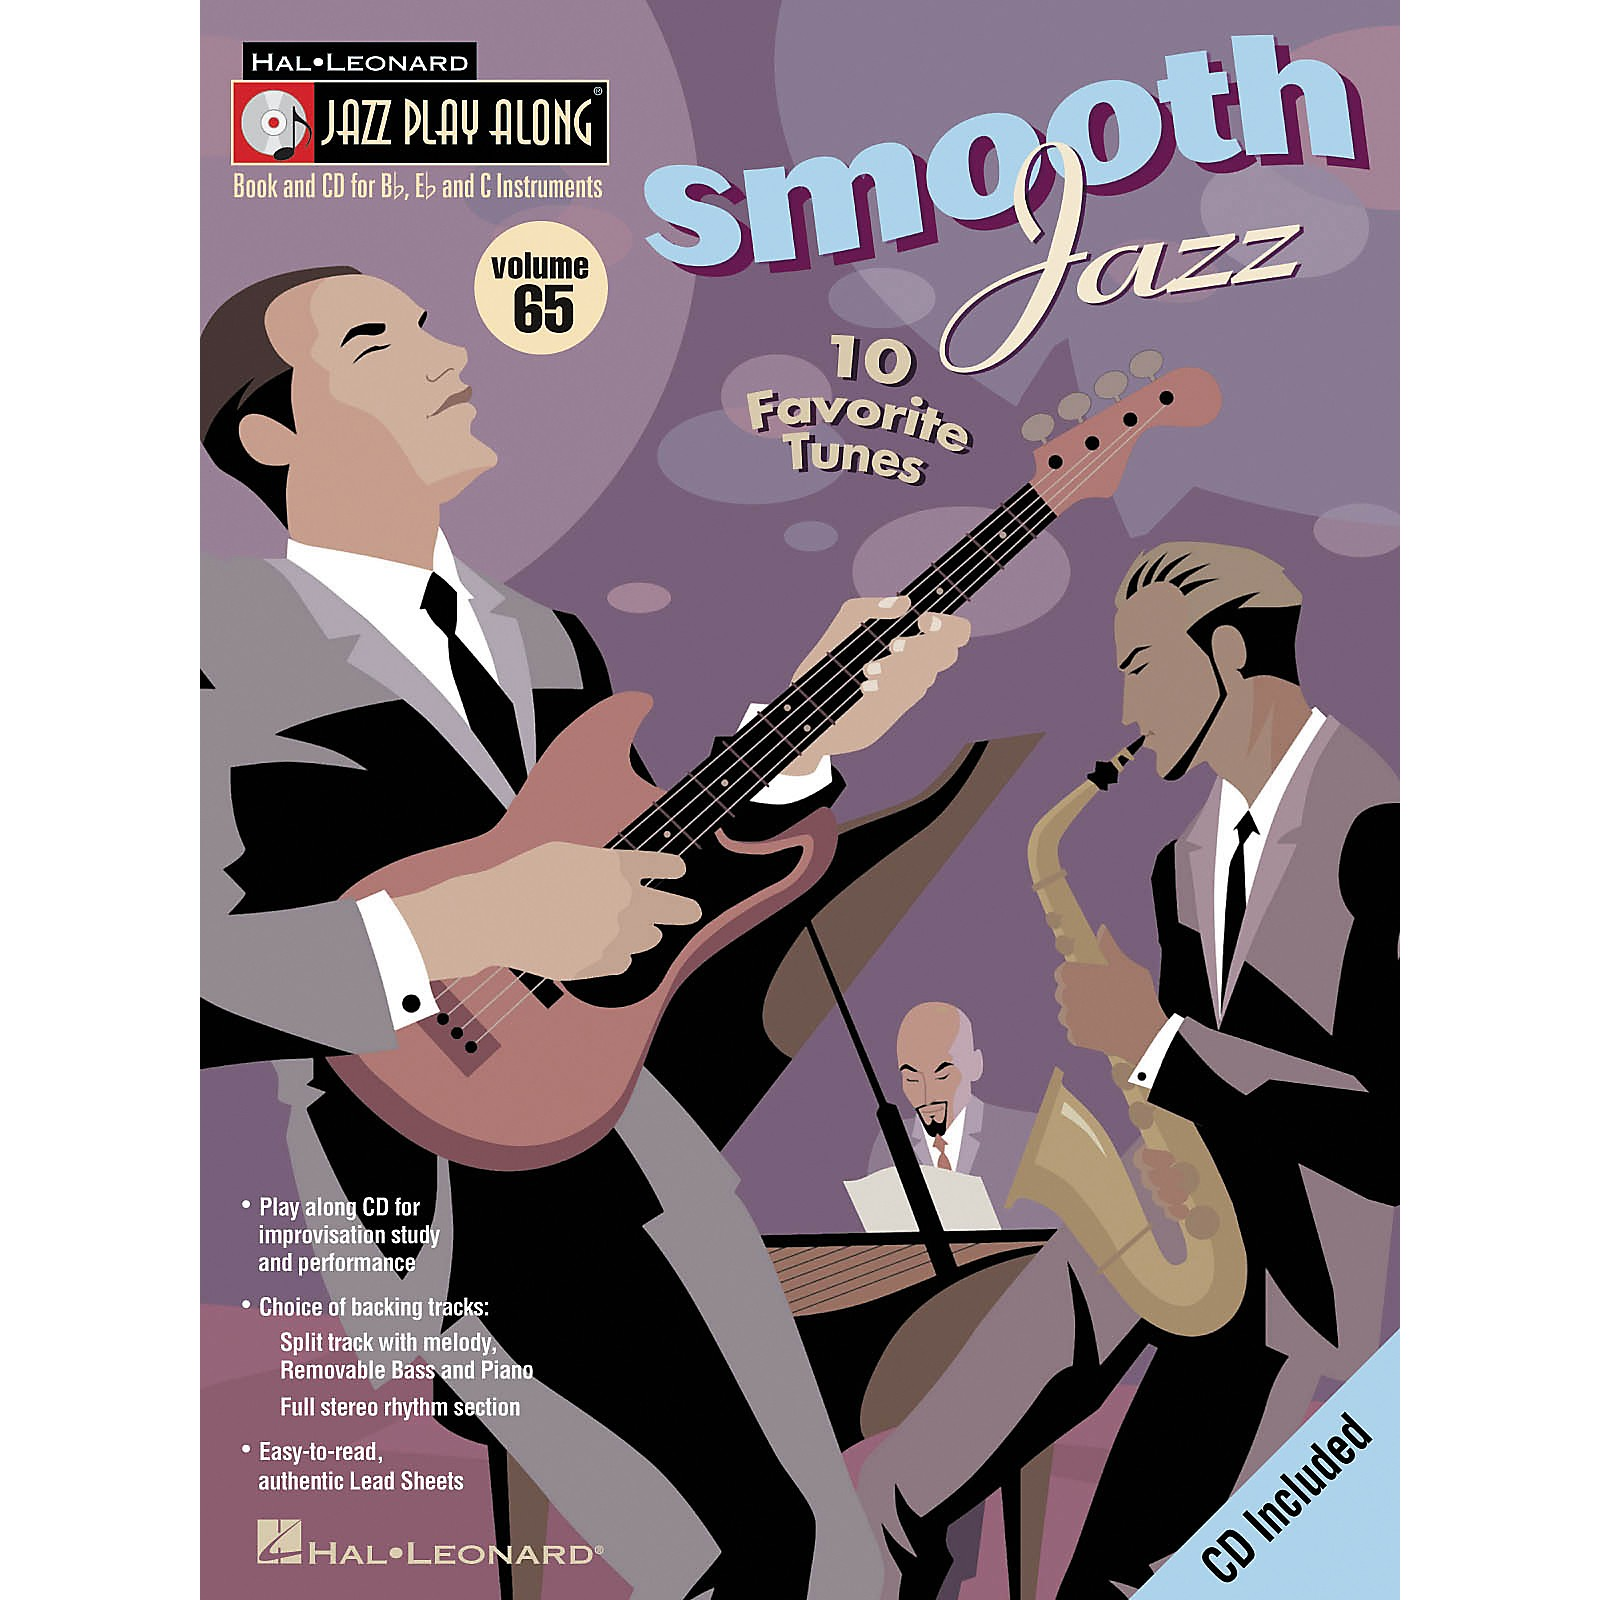 Hal Leonard Smooth Jazz - Jazz Play Along Volume 65 Book CD